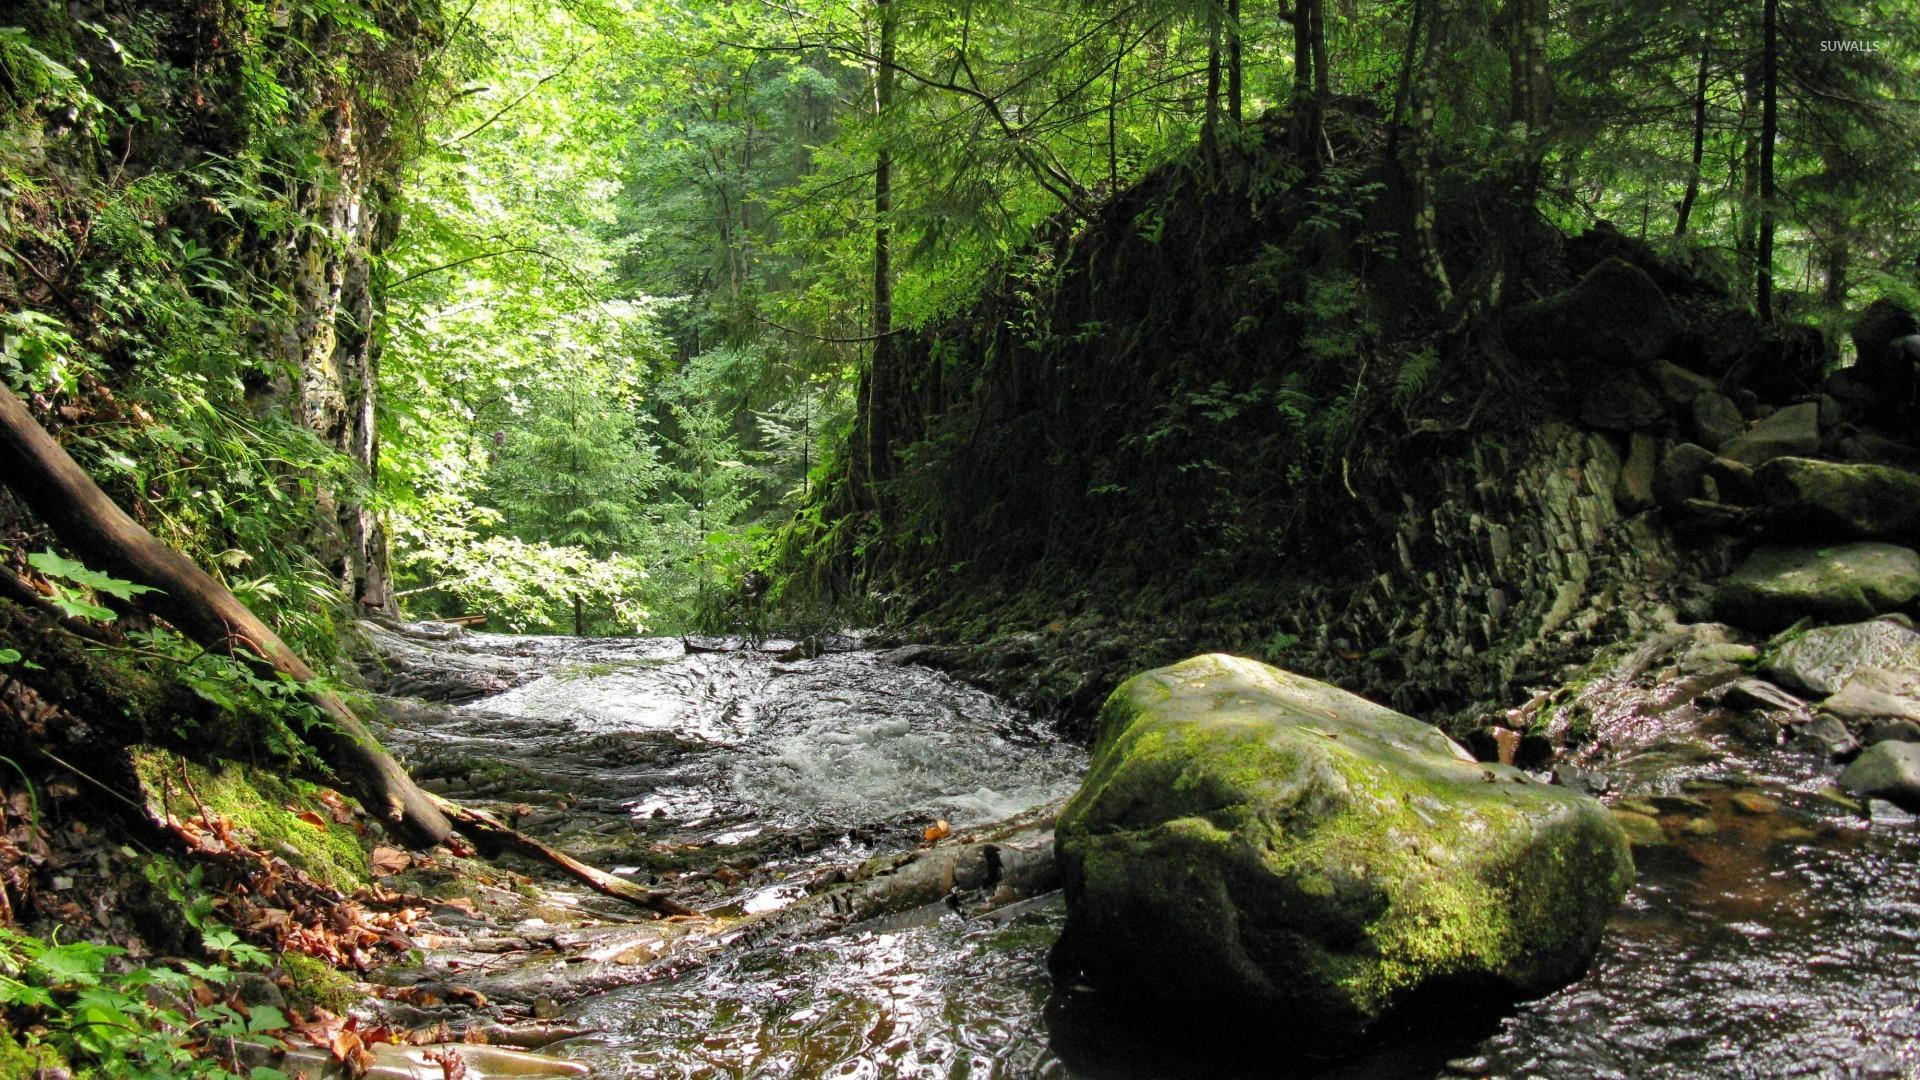 download rocky river wallpaper - photo #18